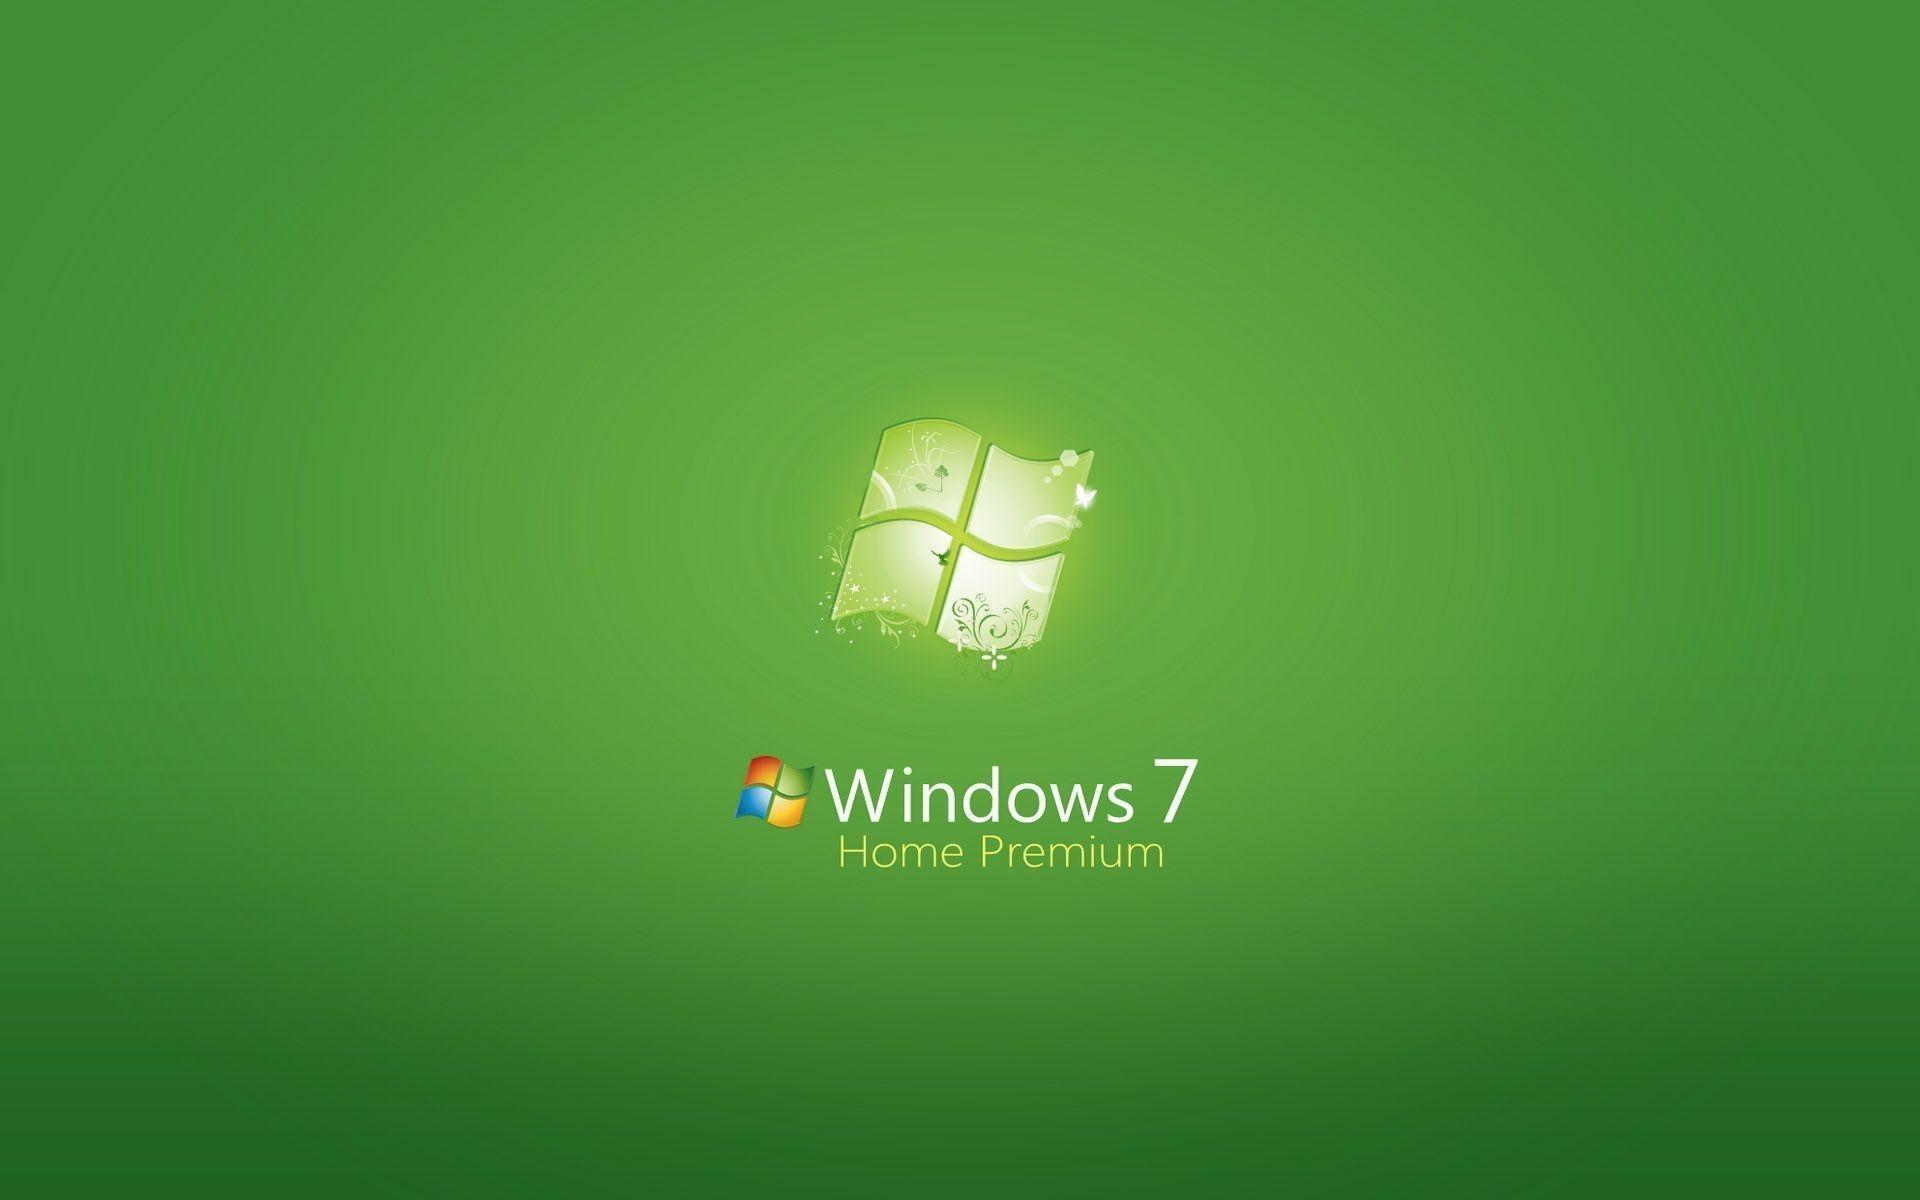 windows 7 home premium wallpapers - wallpaper cave